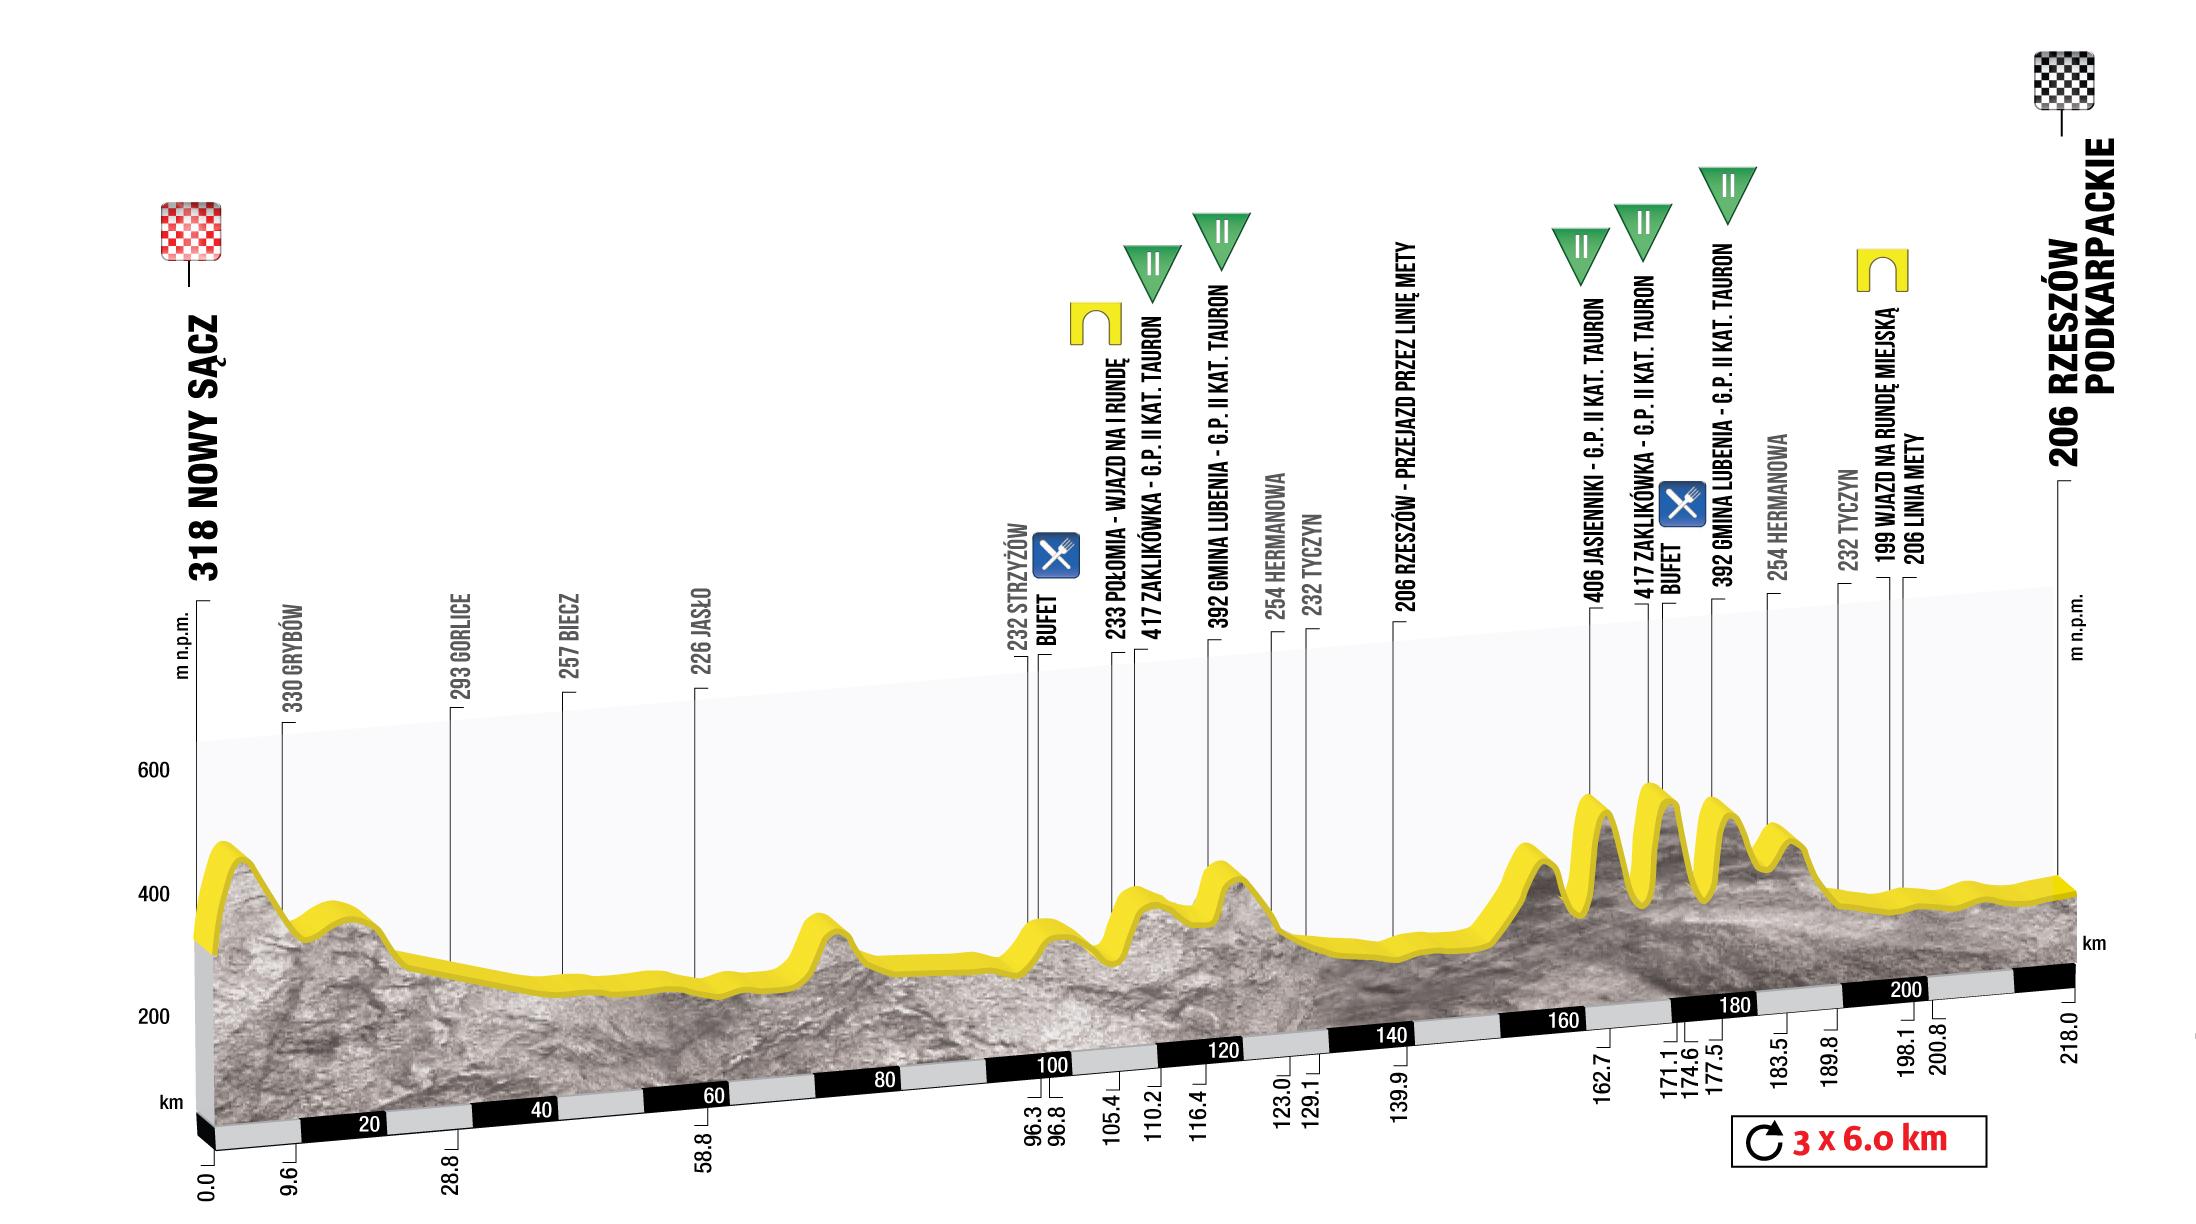 wys_etap4_TdP_UCI_WorldTour